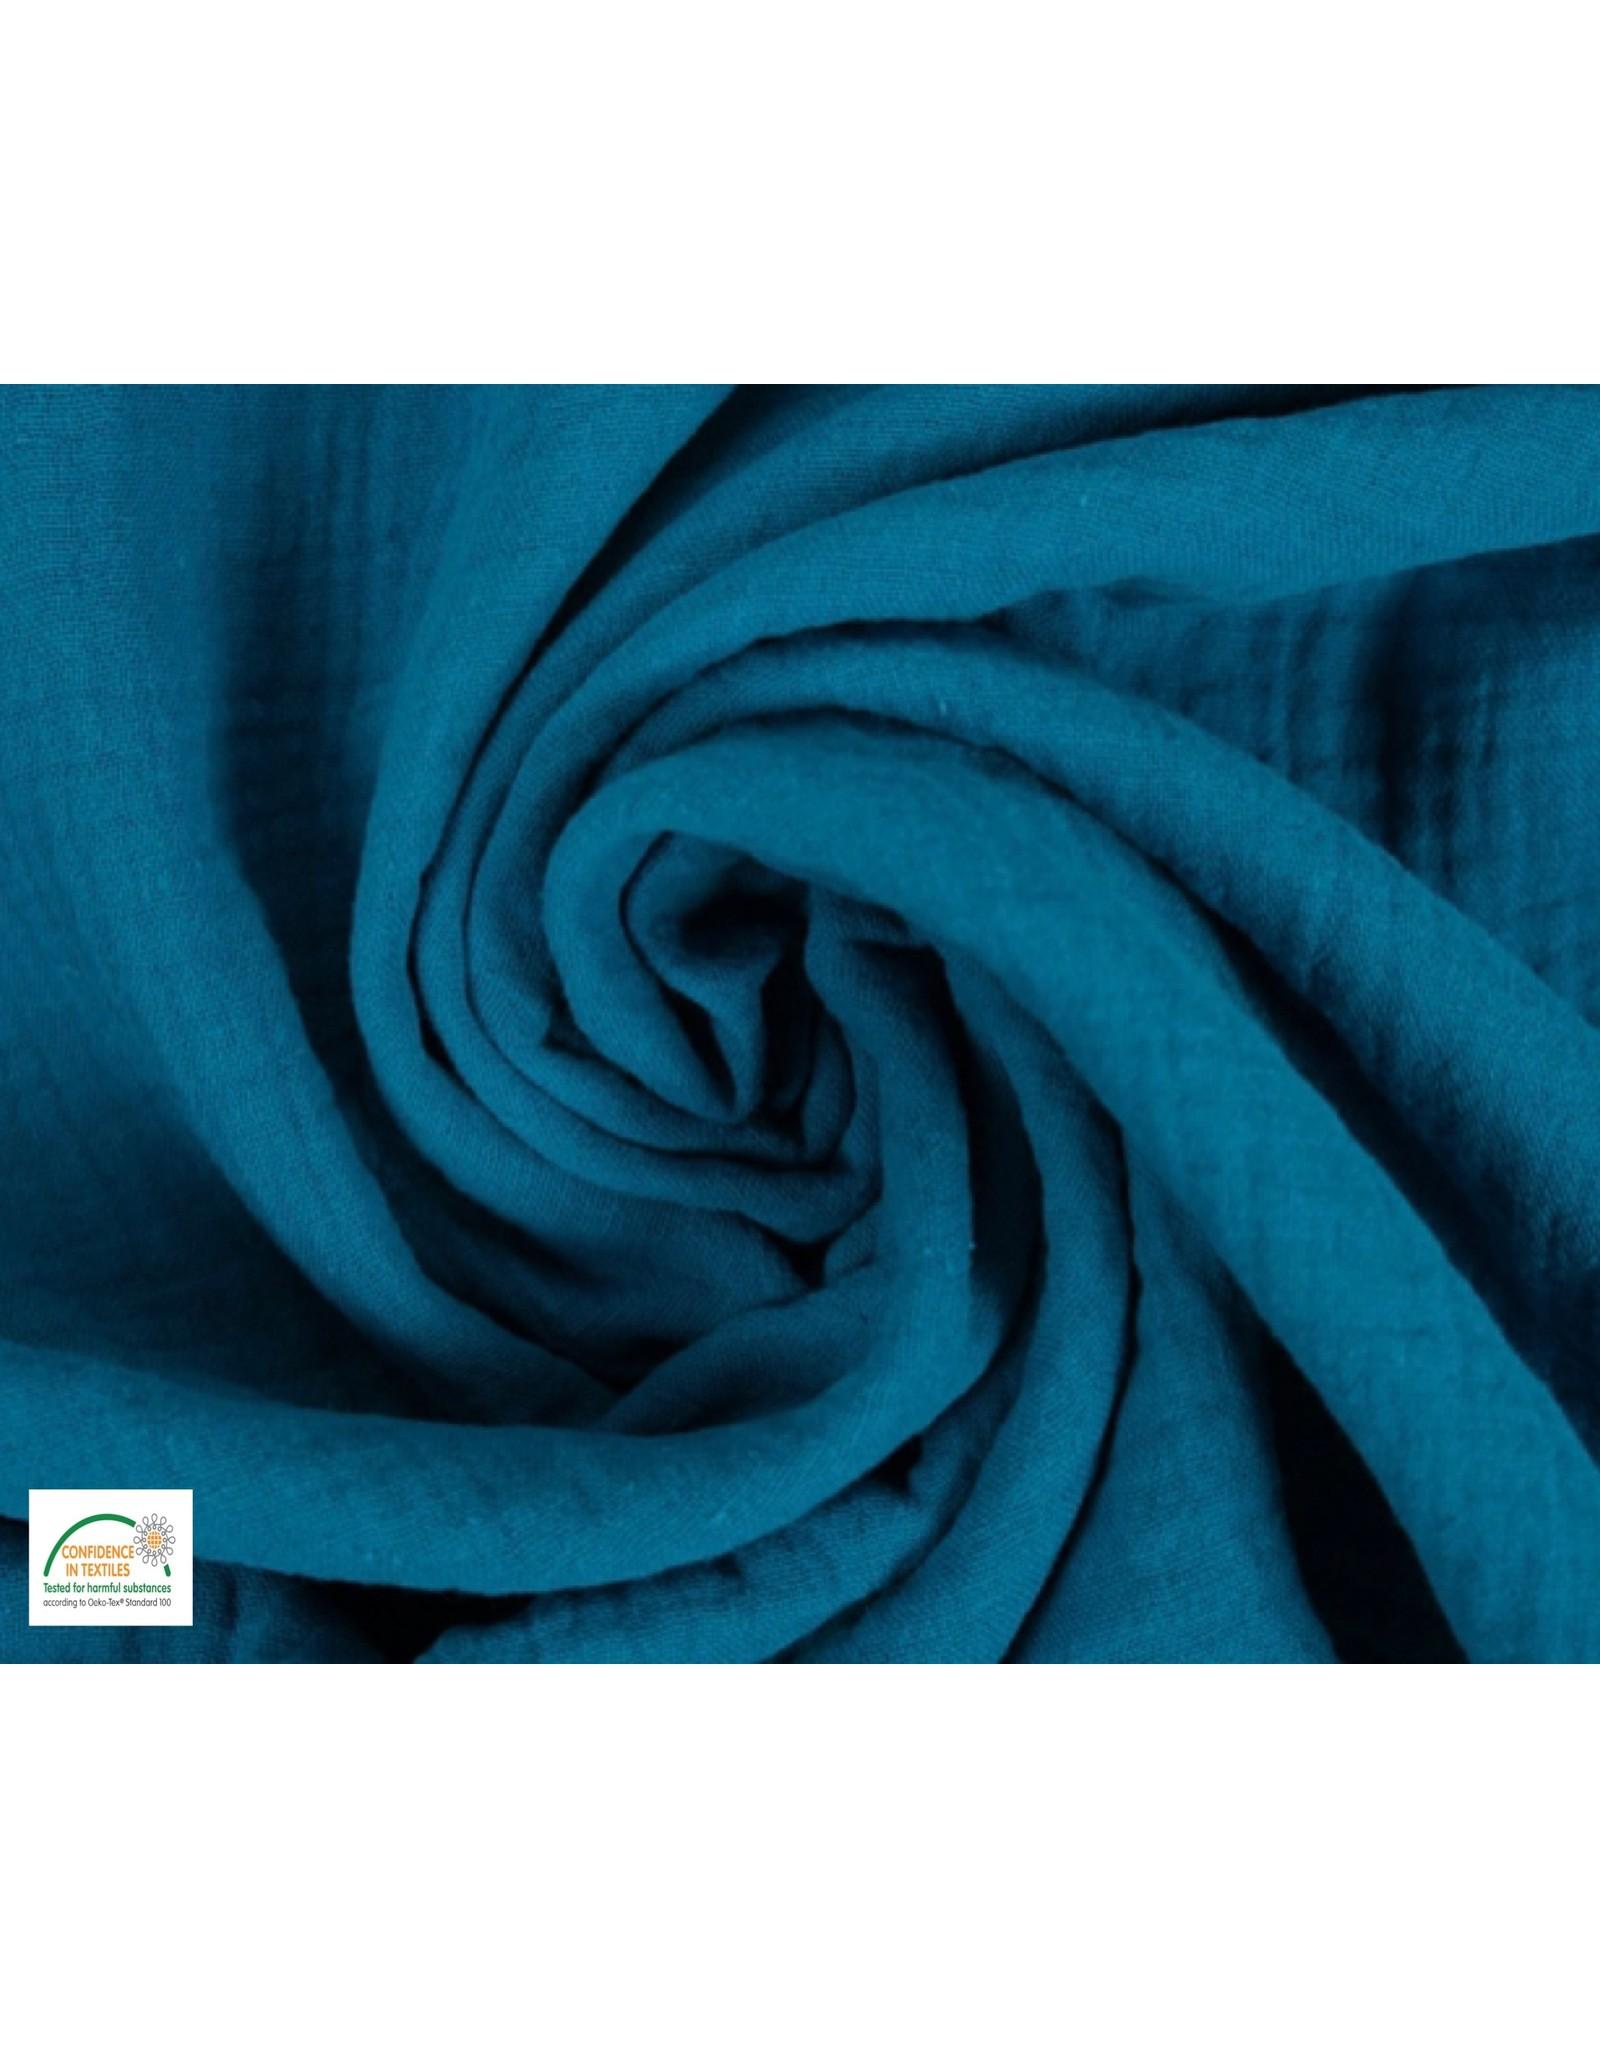 Double Gauze Cotton Turquoise